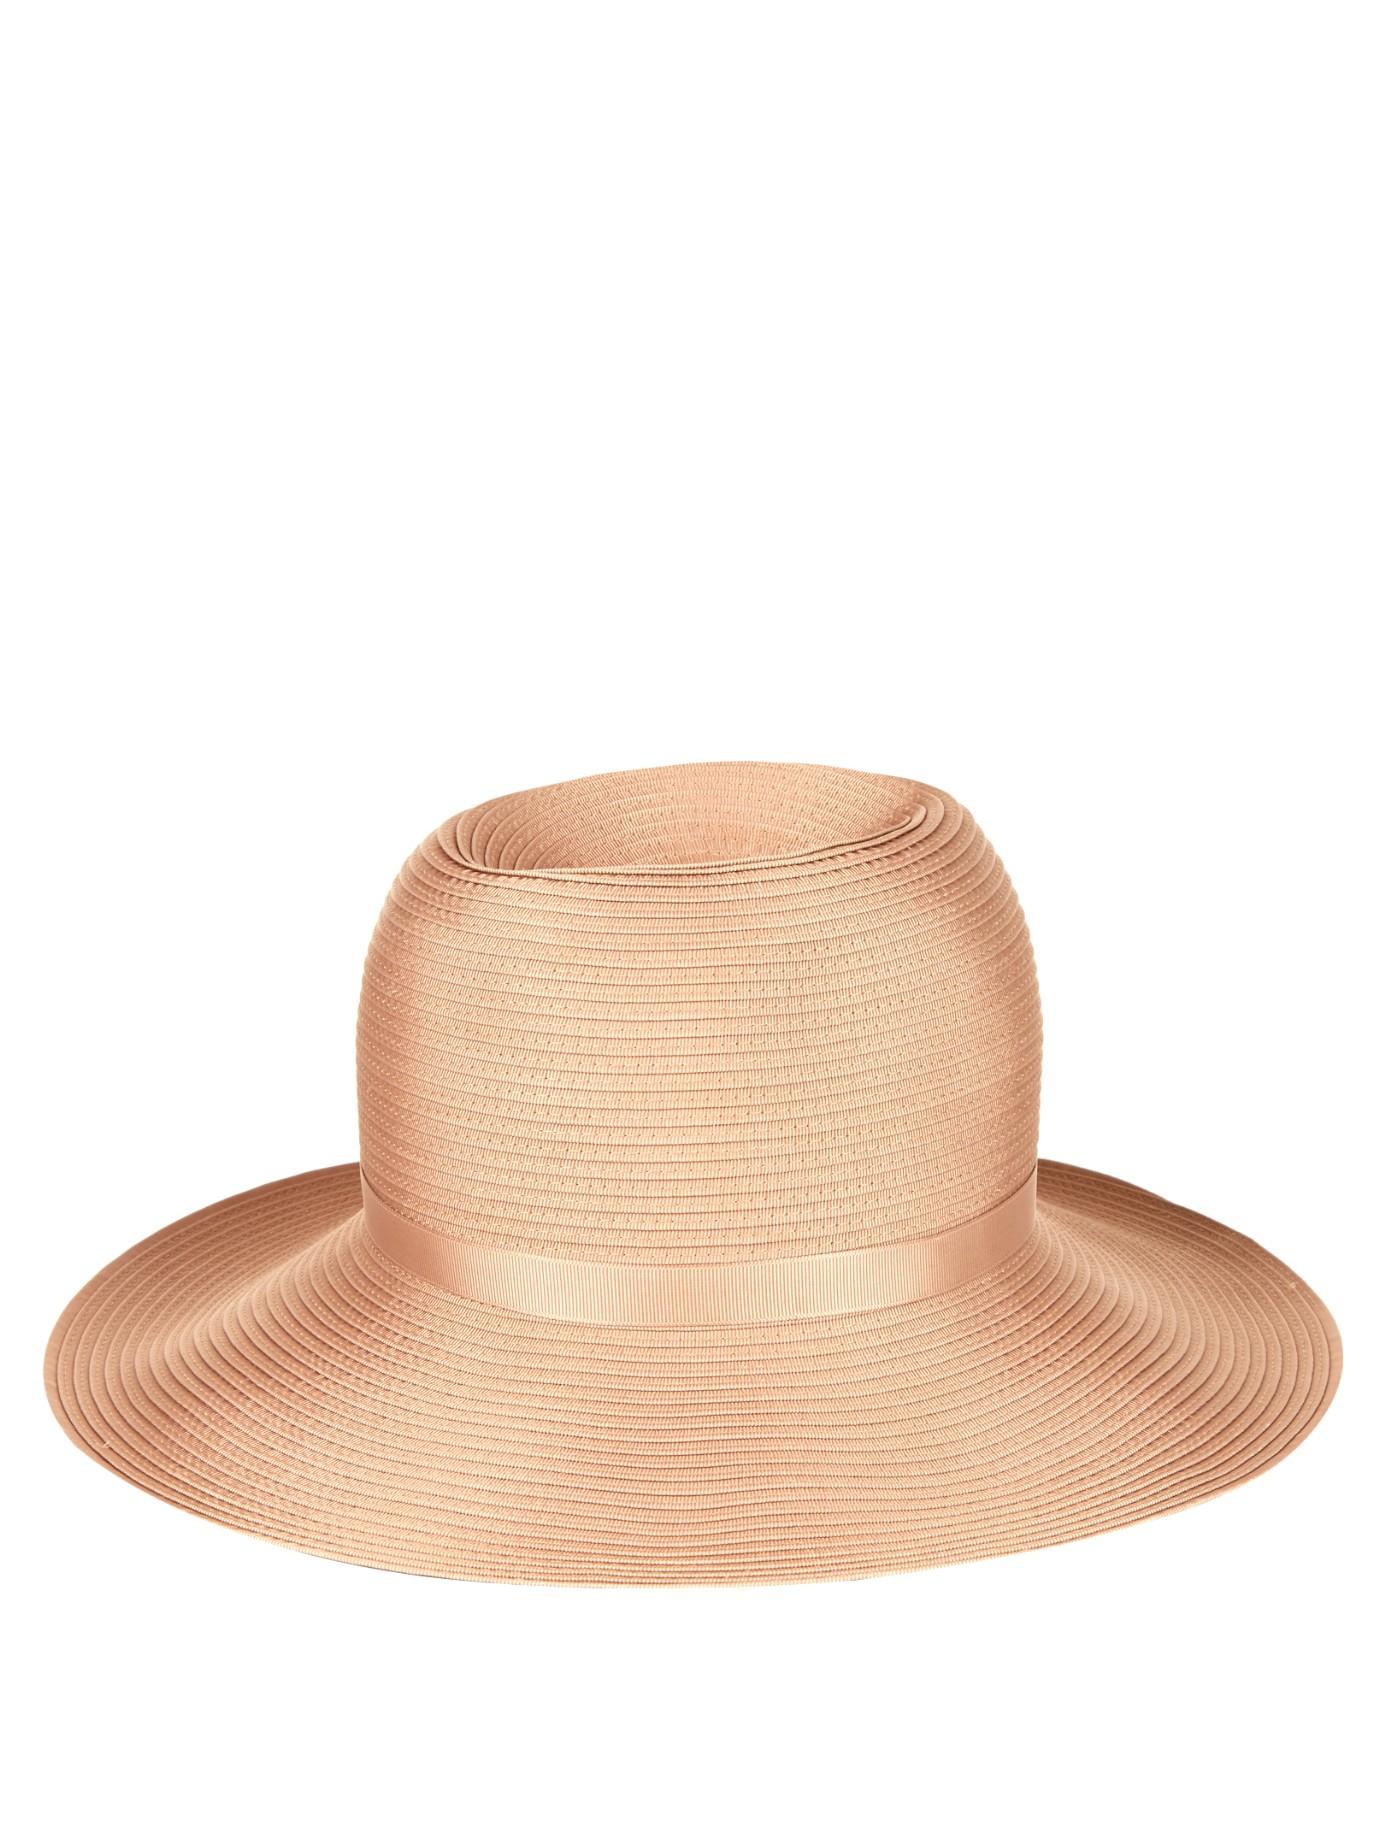 Corbin Sewn Bucket Hat Gigi Burris Millinery 7HNkYBWQ